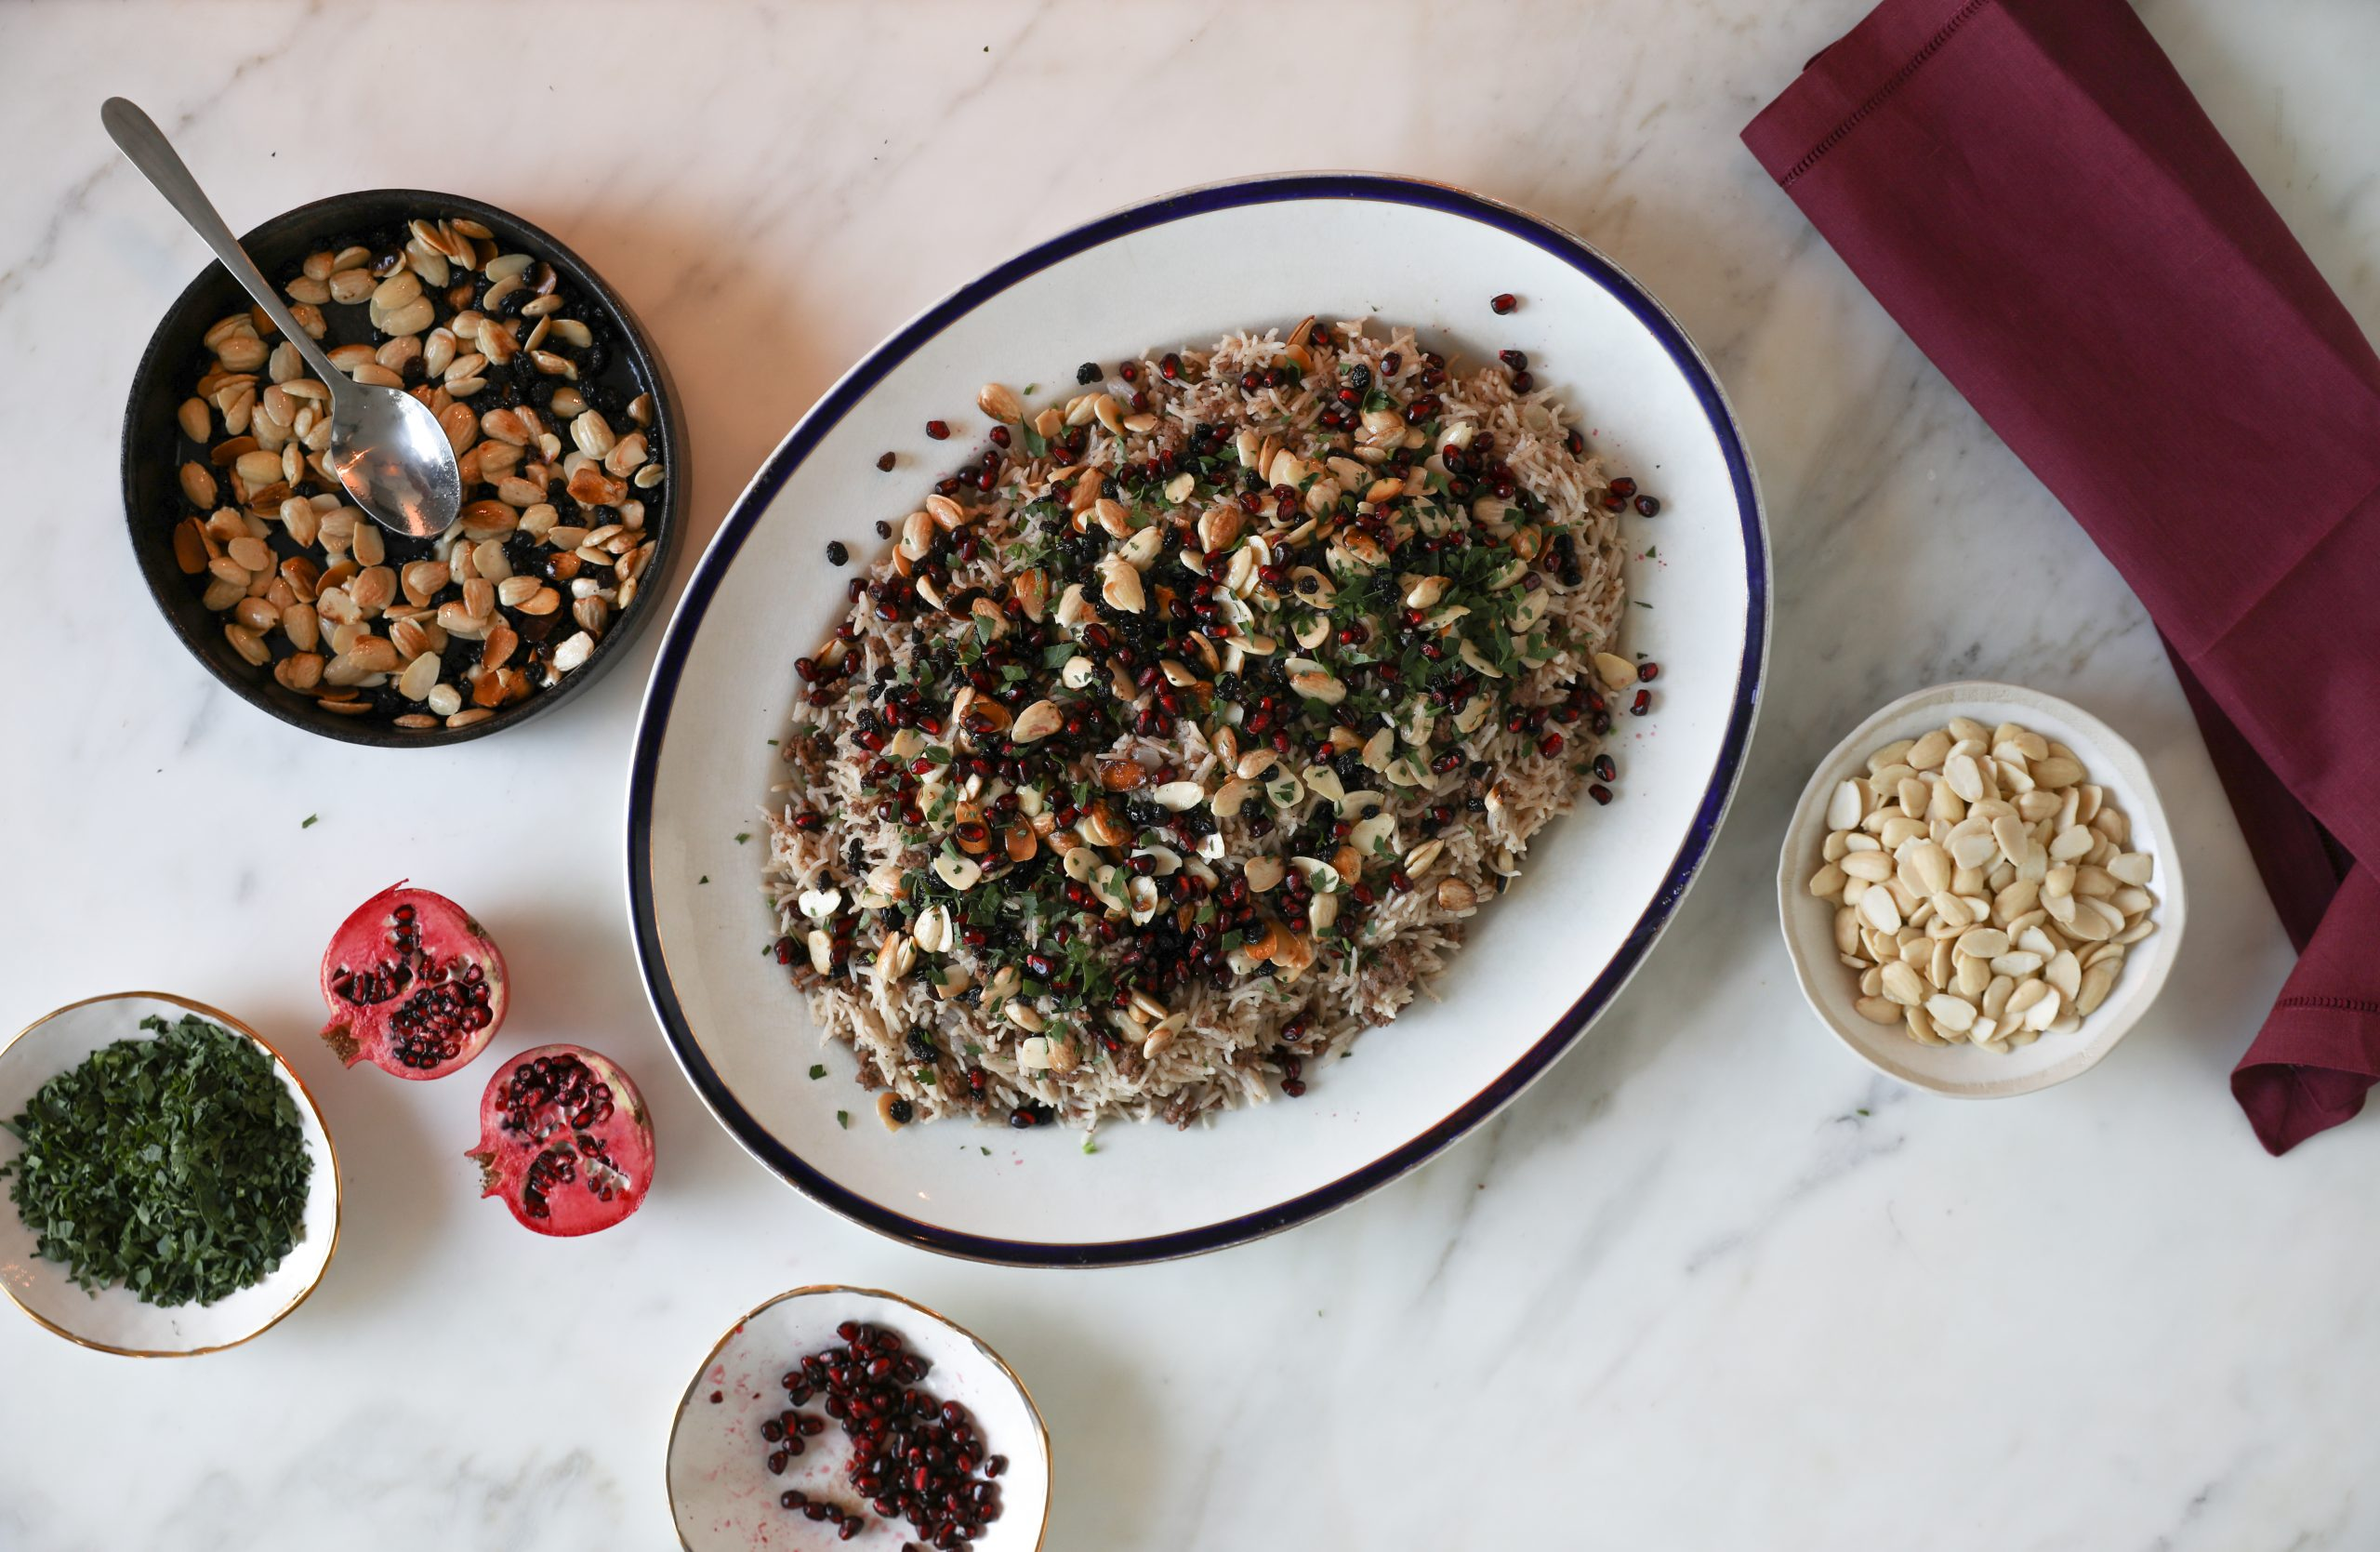 Tagrid's Lebanese Spiced Rice